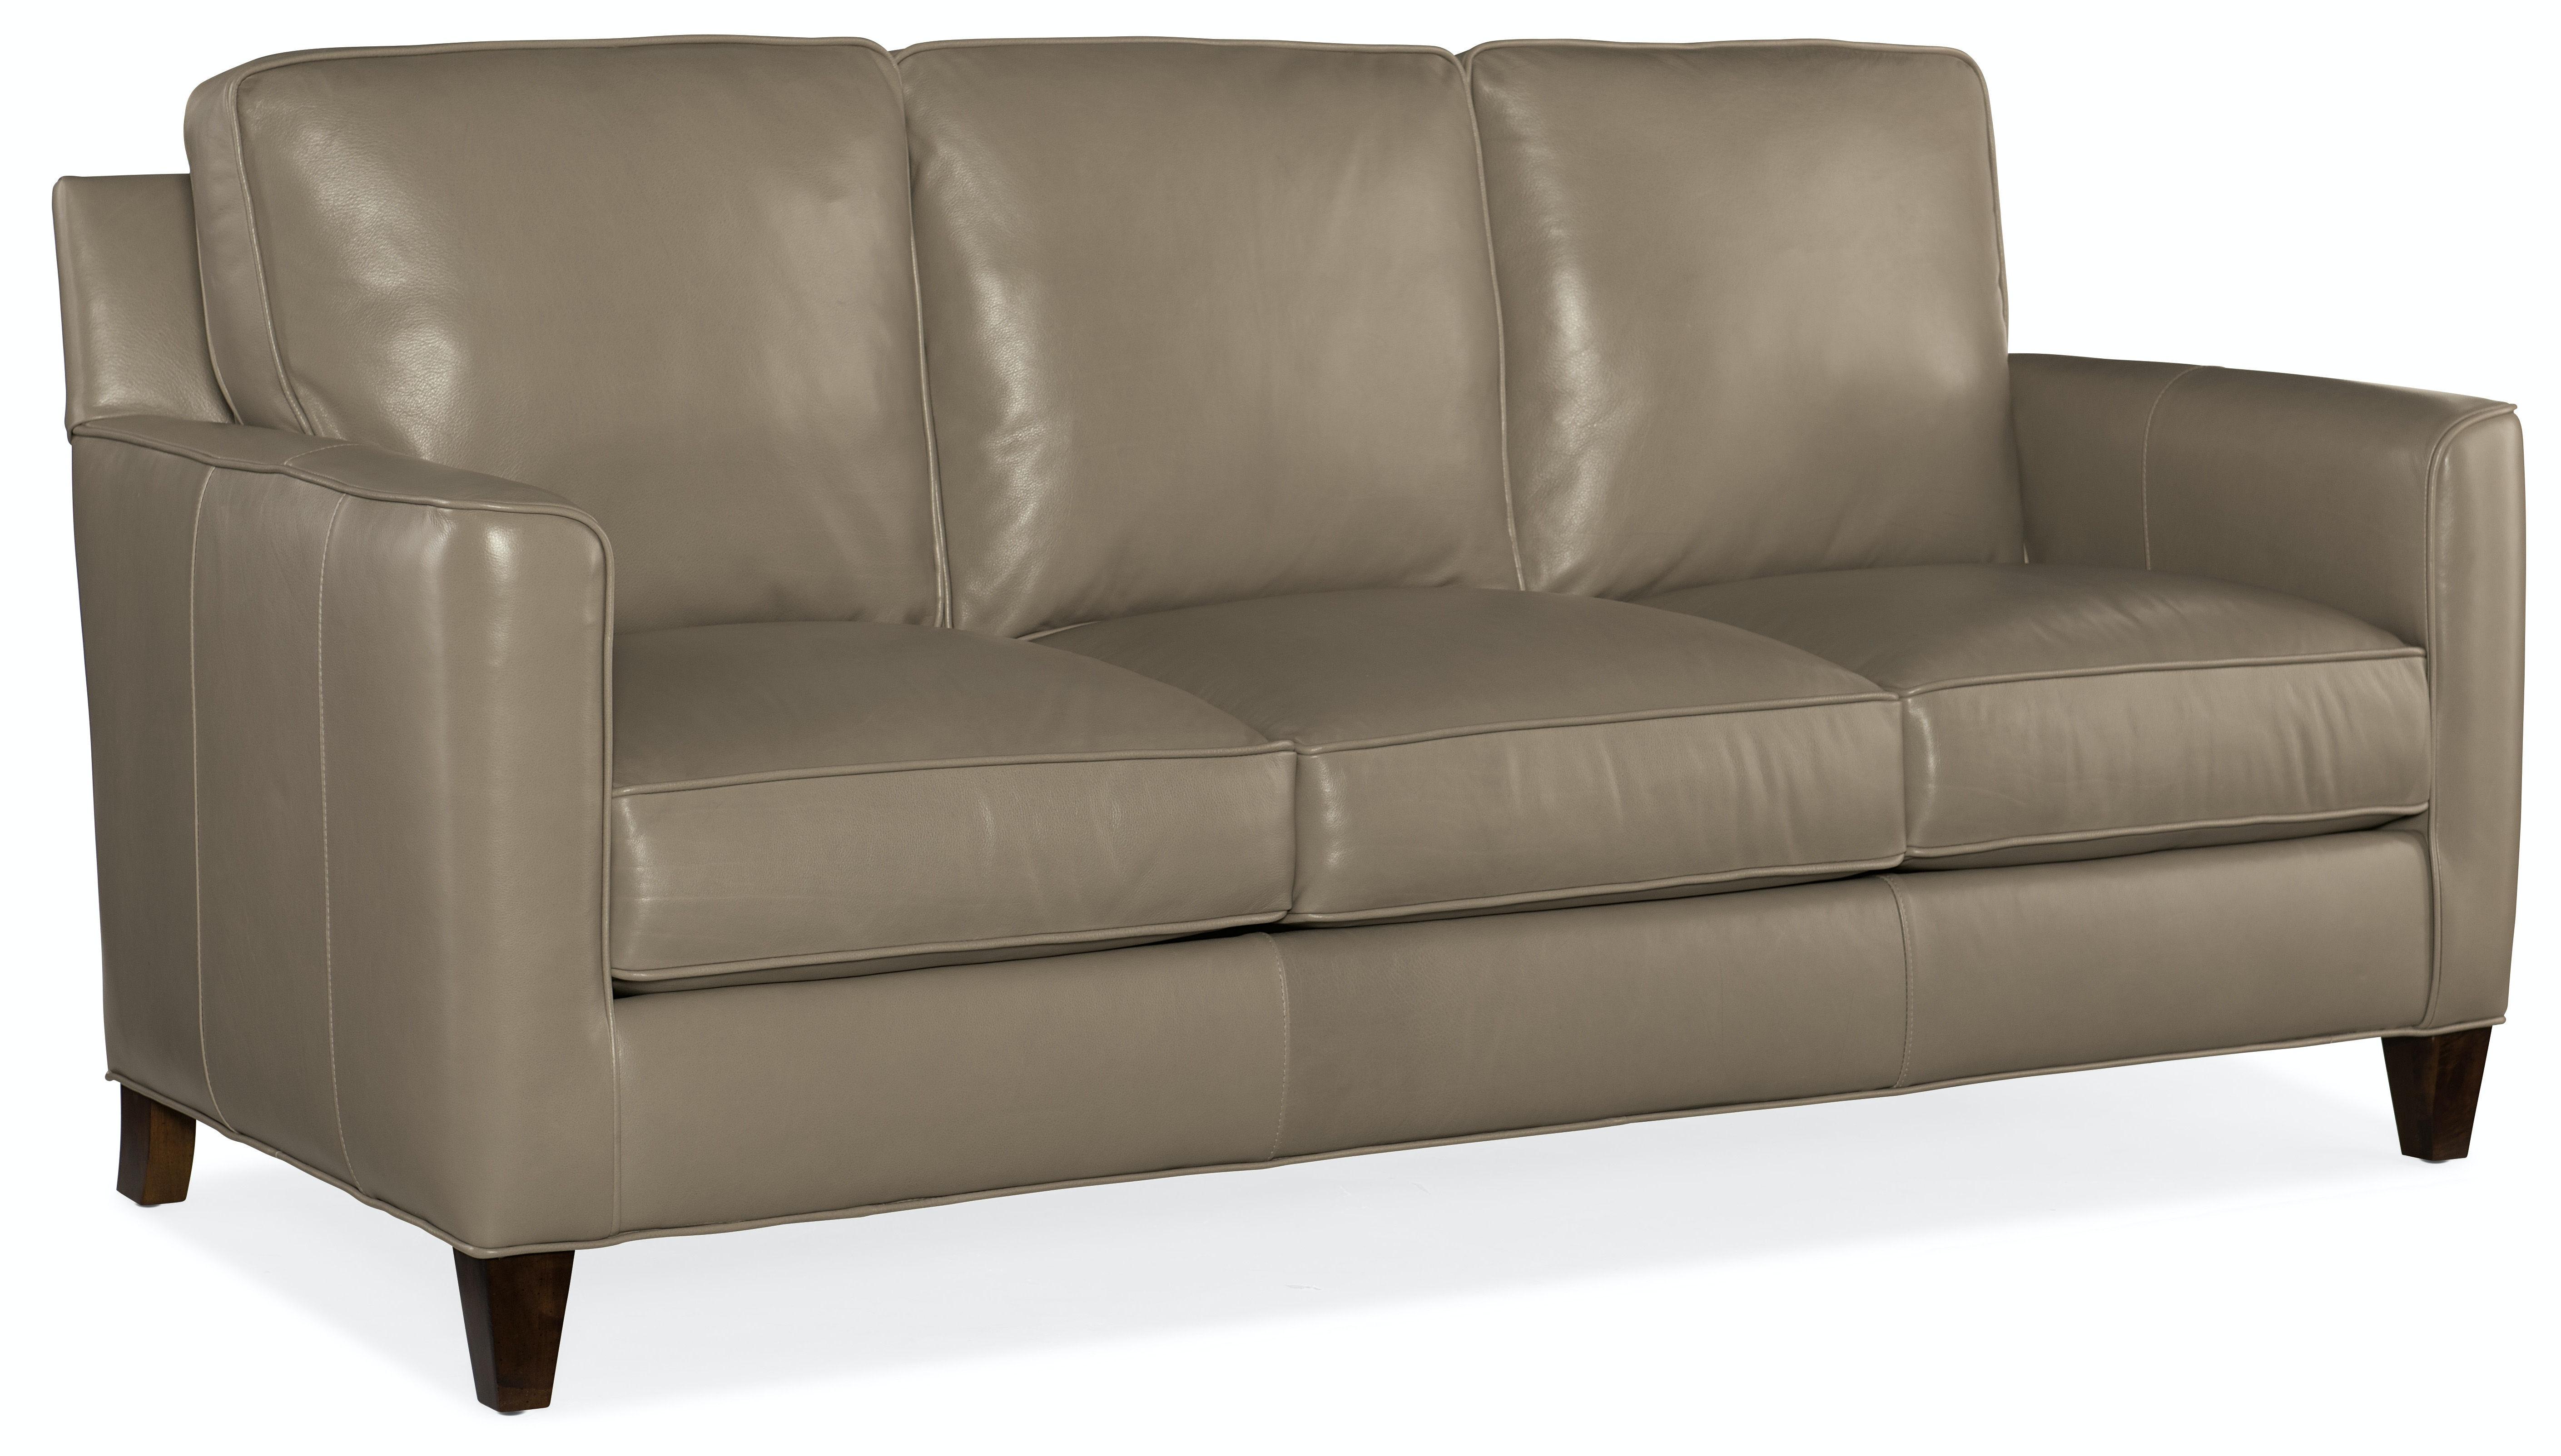 Bradington Young Living Room Yorba Stationary Sofa 8 Way Tie 508 95